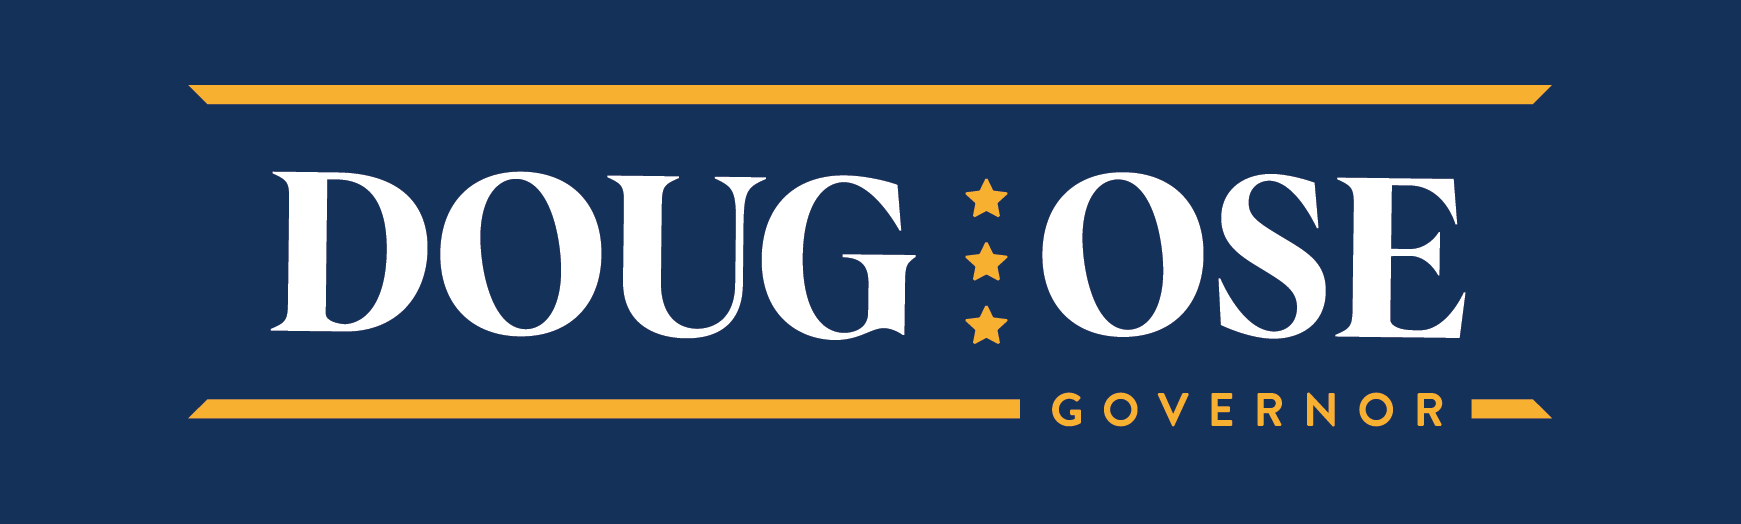 ose logo gov blu background